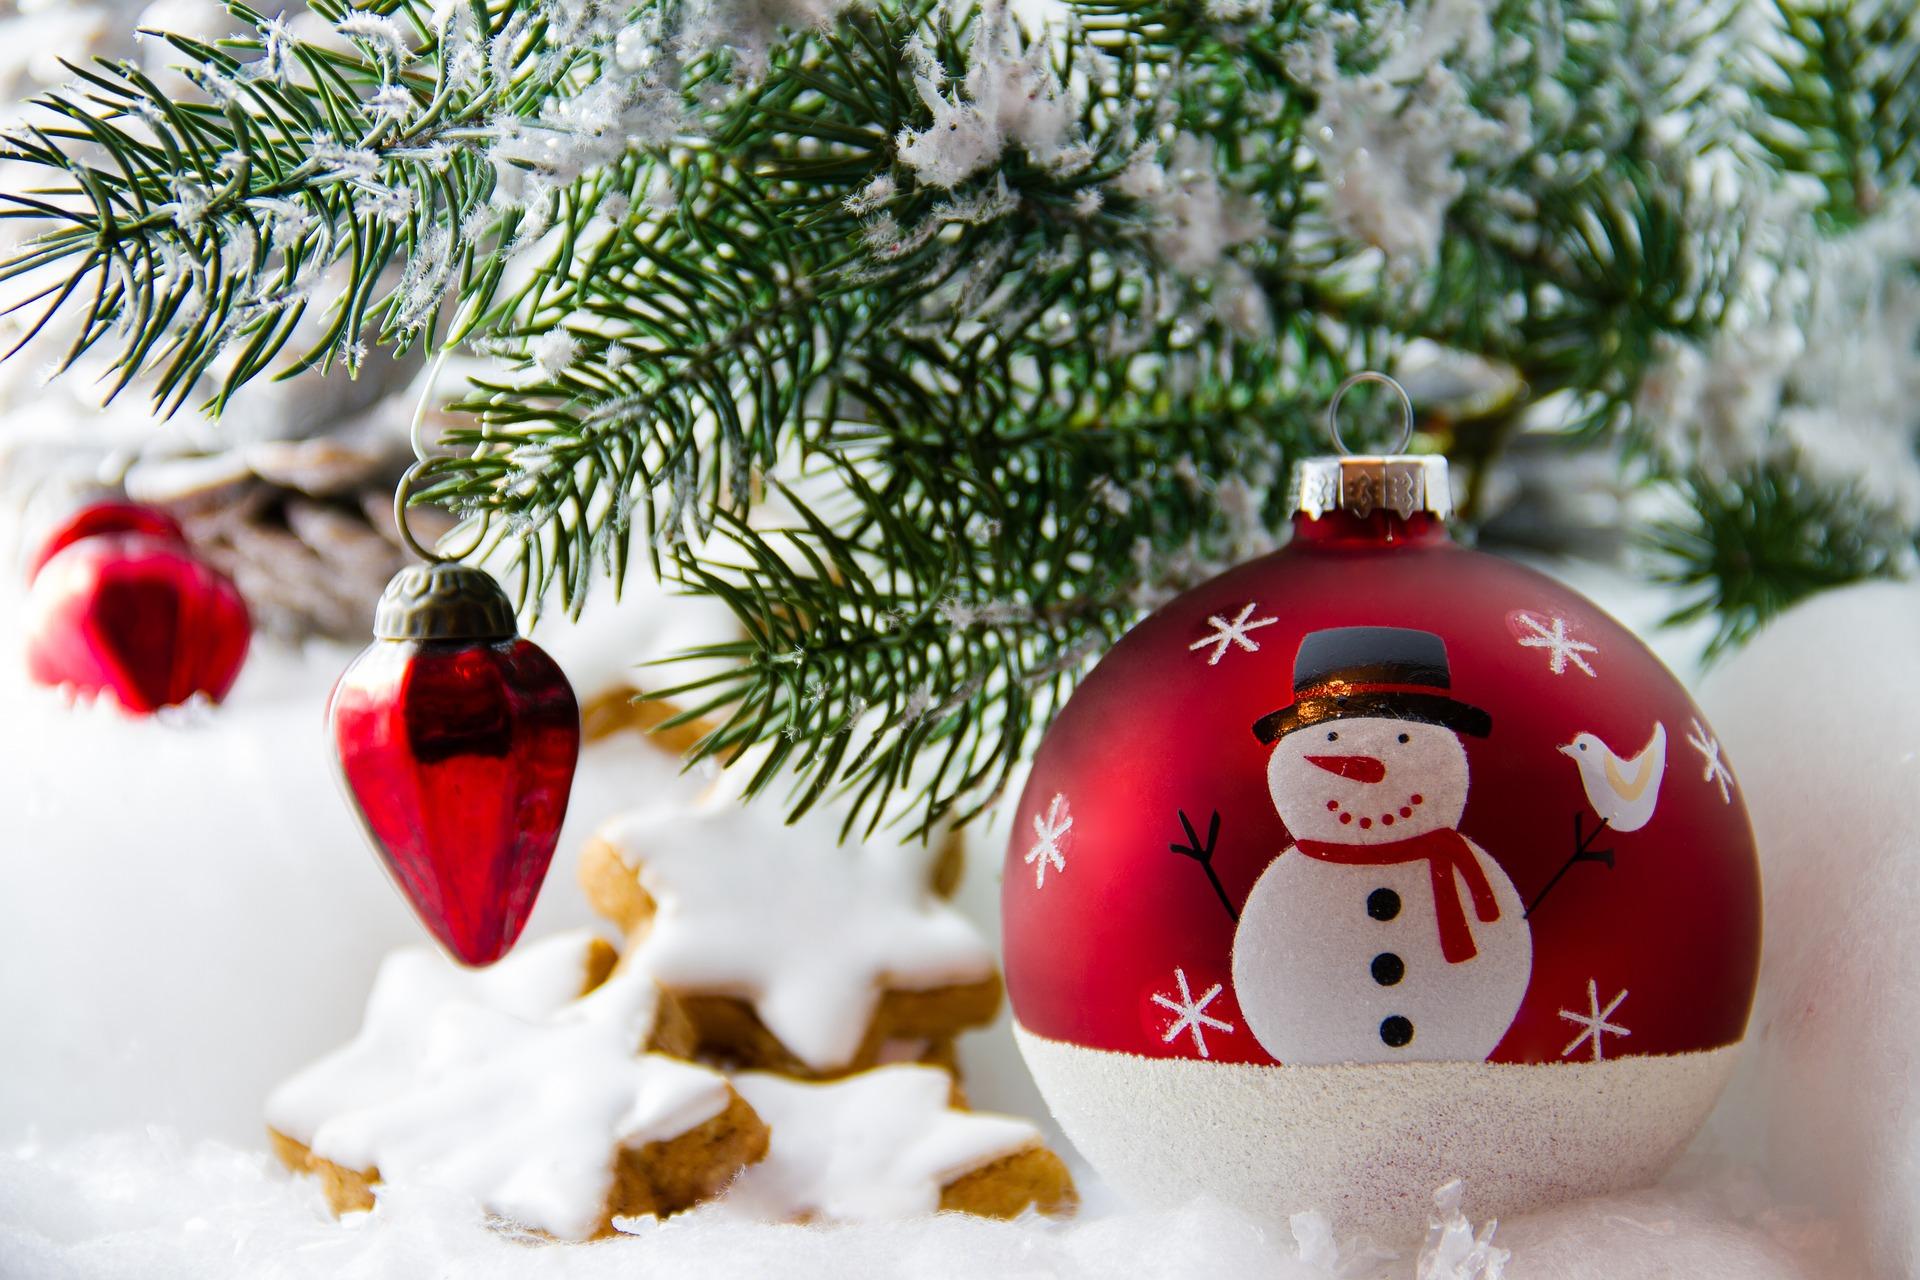 holidays home improvement, Christmas decorations